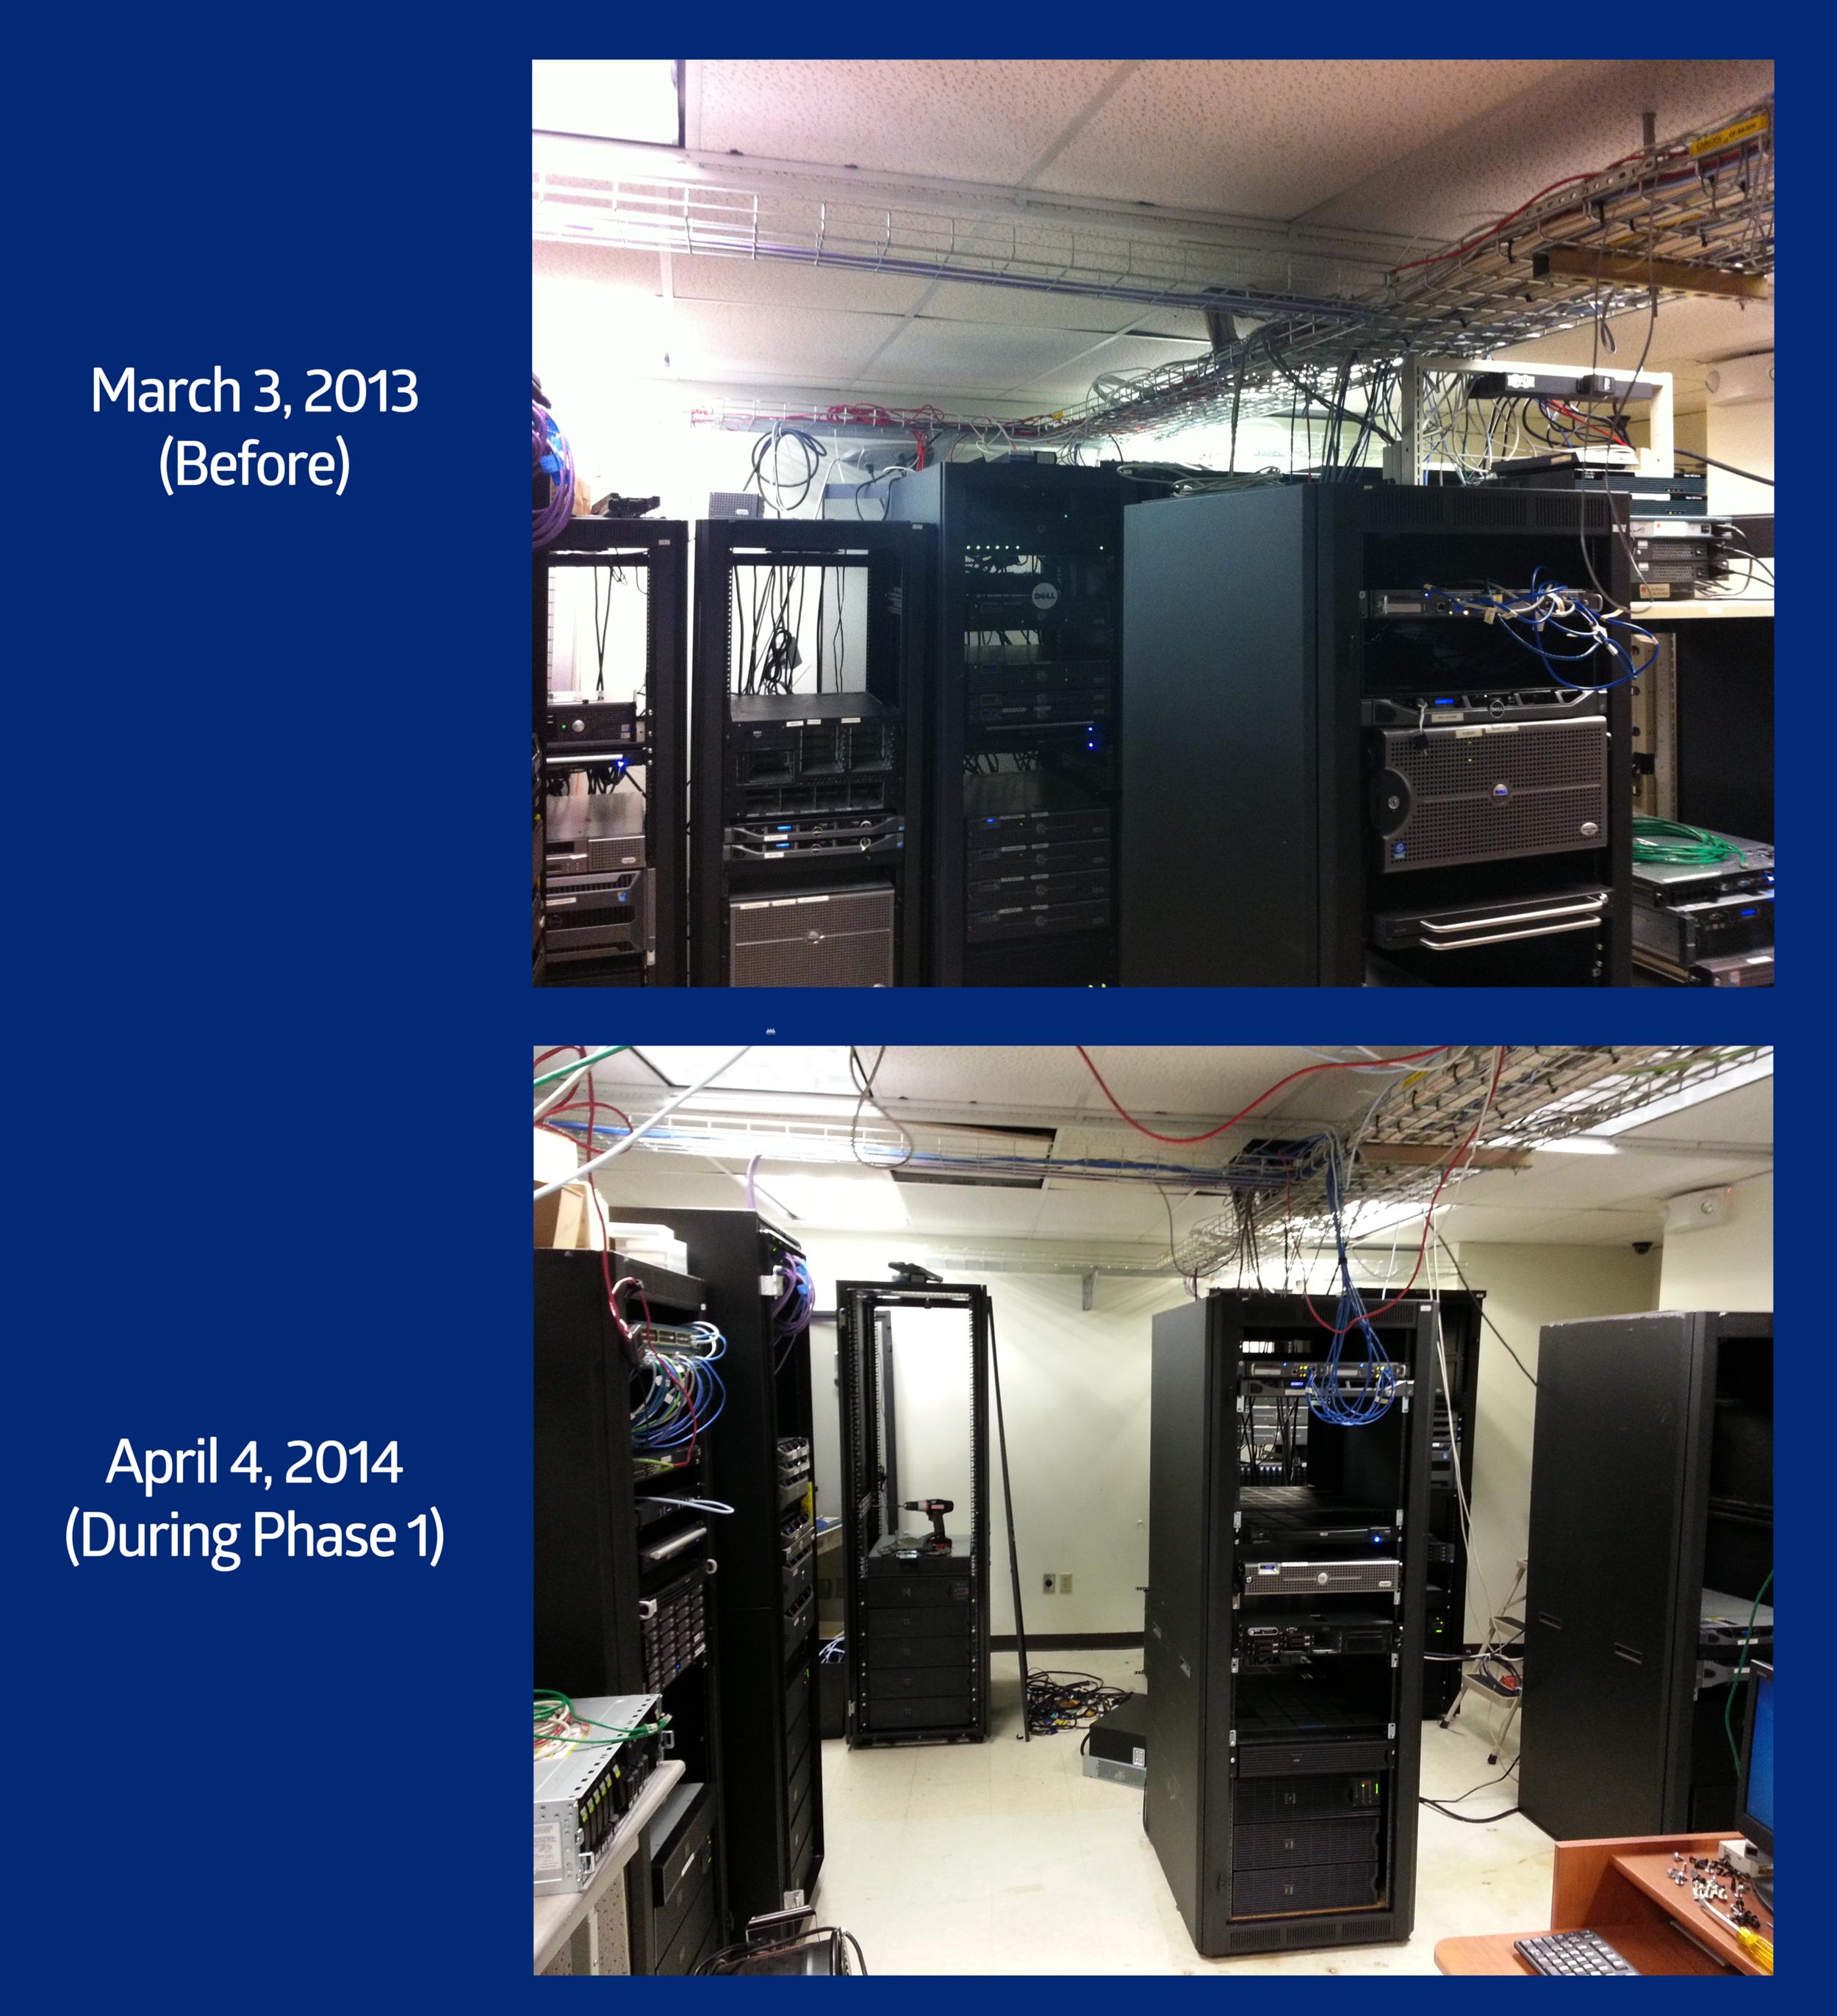 General Photo of Server Room